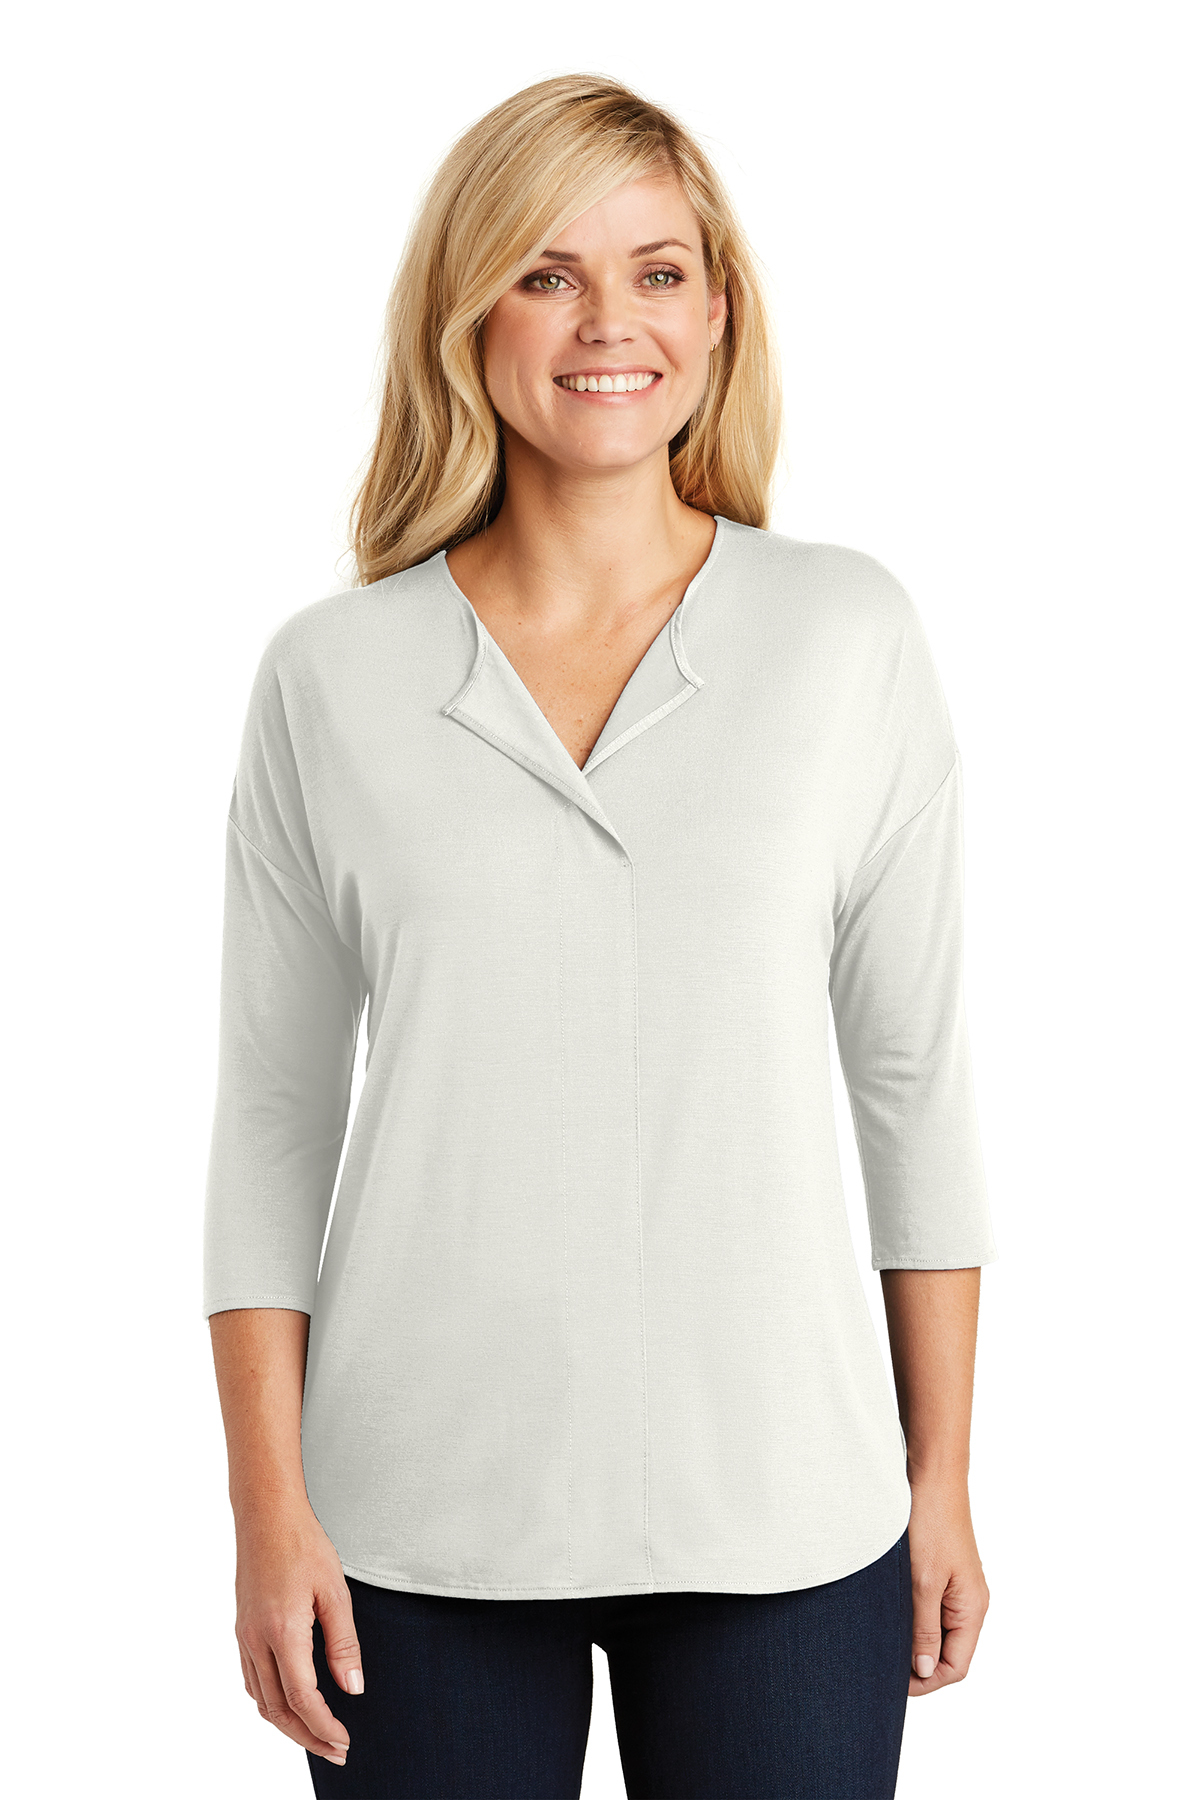 226a3d939 Port Authority® Ladies Concept 3 4-Sleeve Soft Split Neck Top. Brand Logo